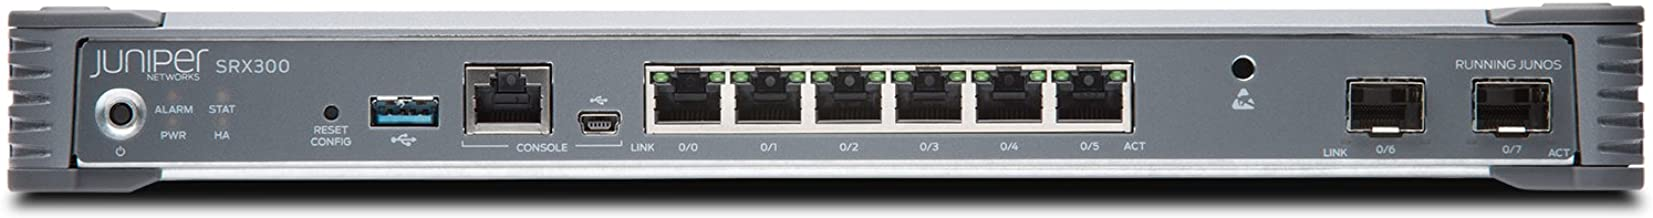 Juniper Networks SRX300 Services Gateway - security appliance